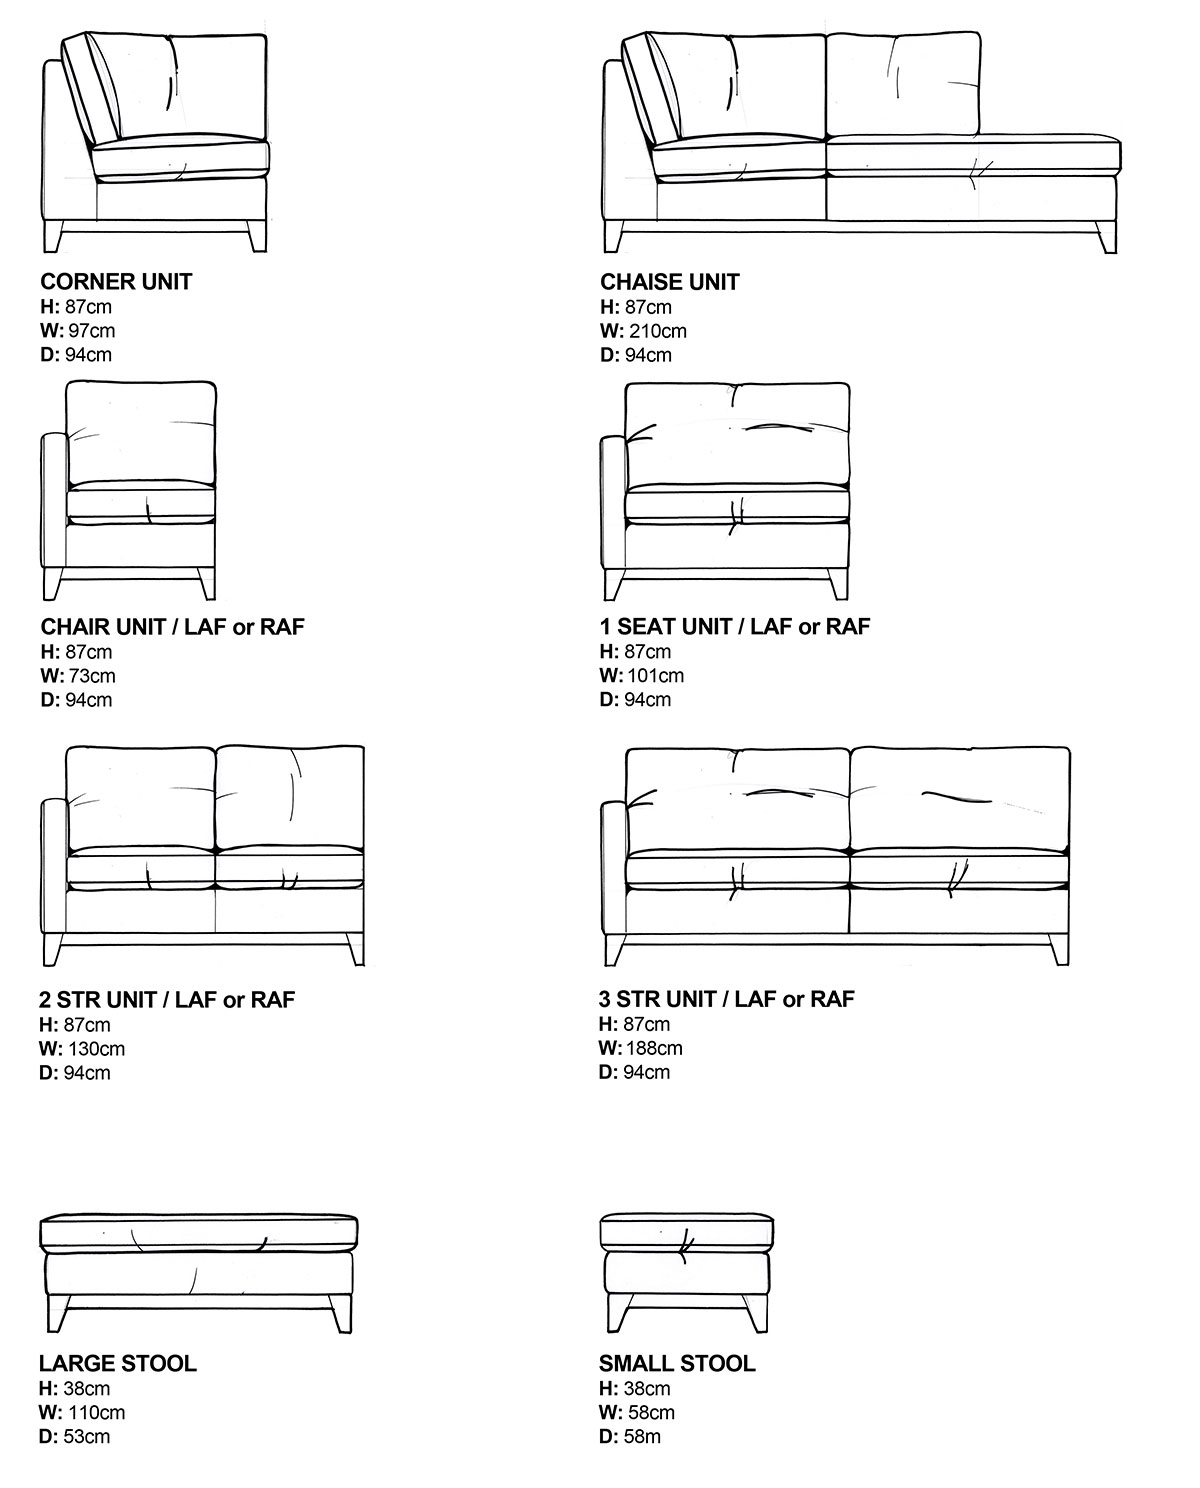 Yeoman-Line-Drawings-drake.jpg